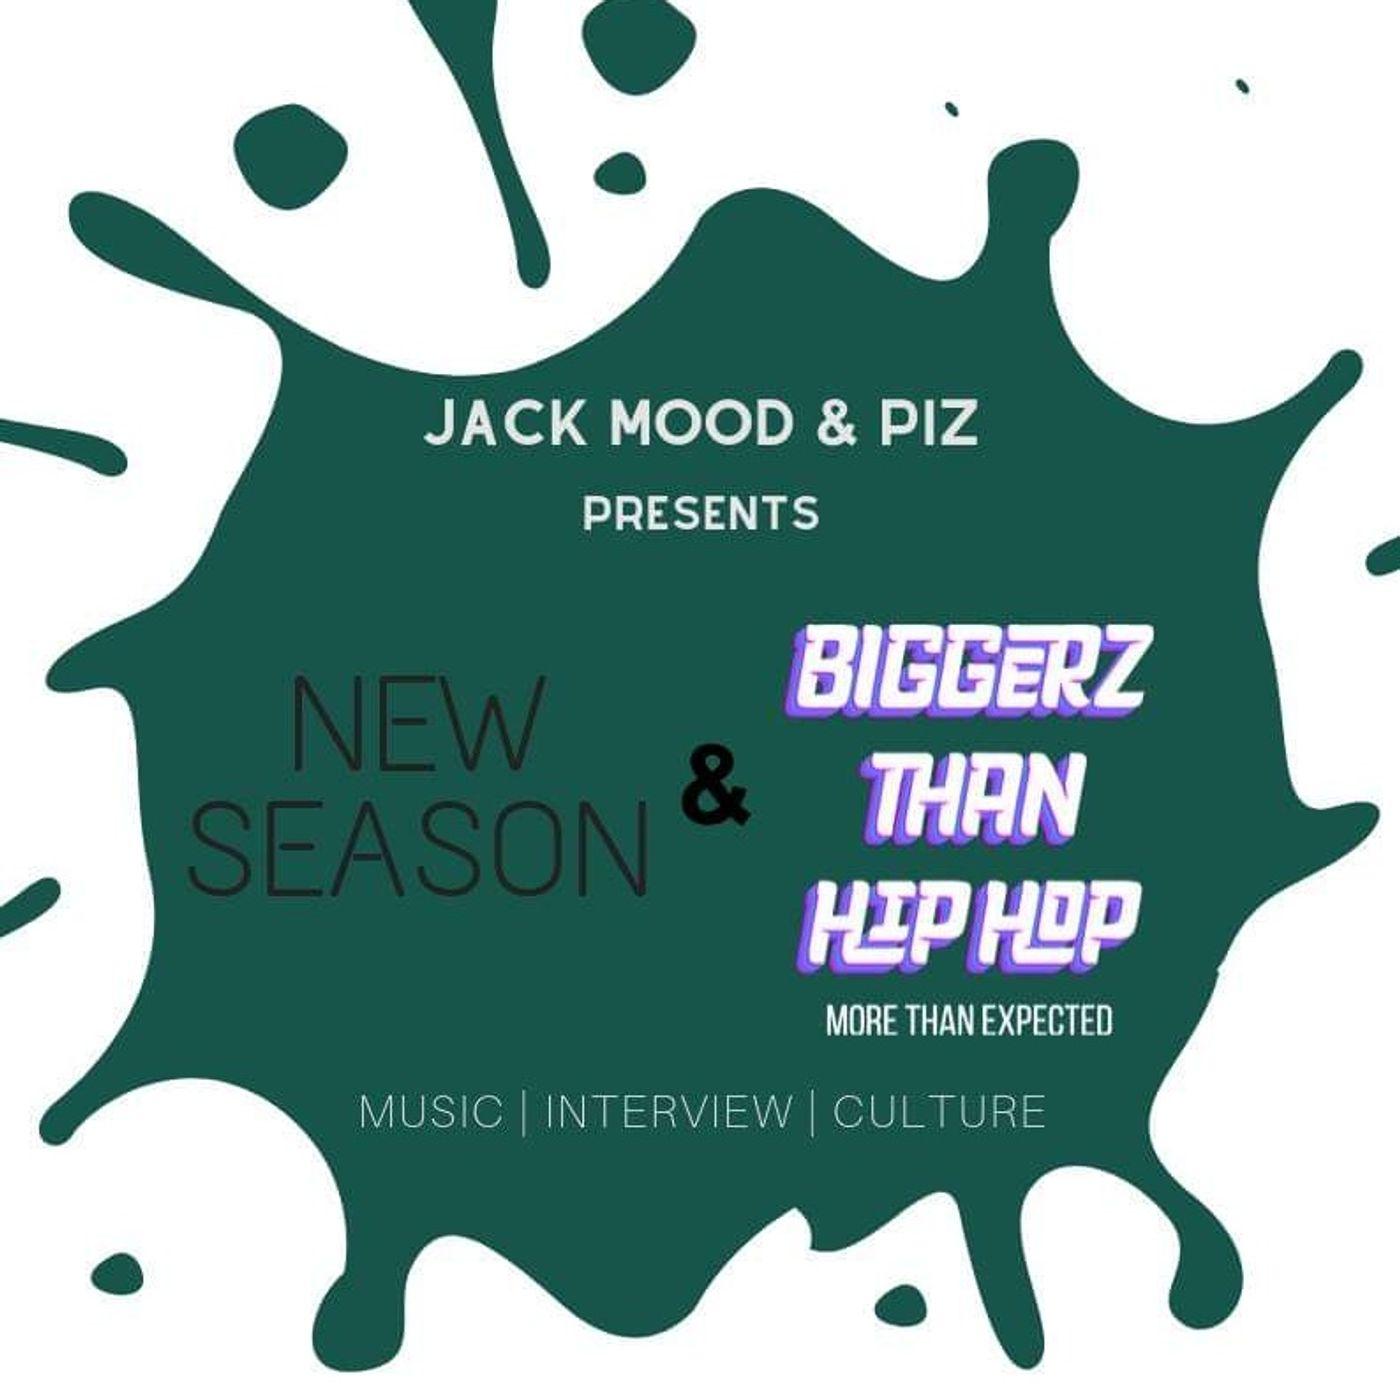 Lord Madness - Jack, Mood & Piz presents Biggerz Than Hip-Hop - s01e05